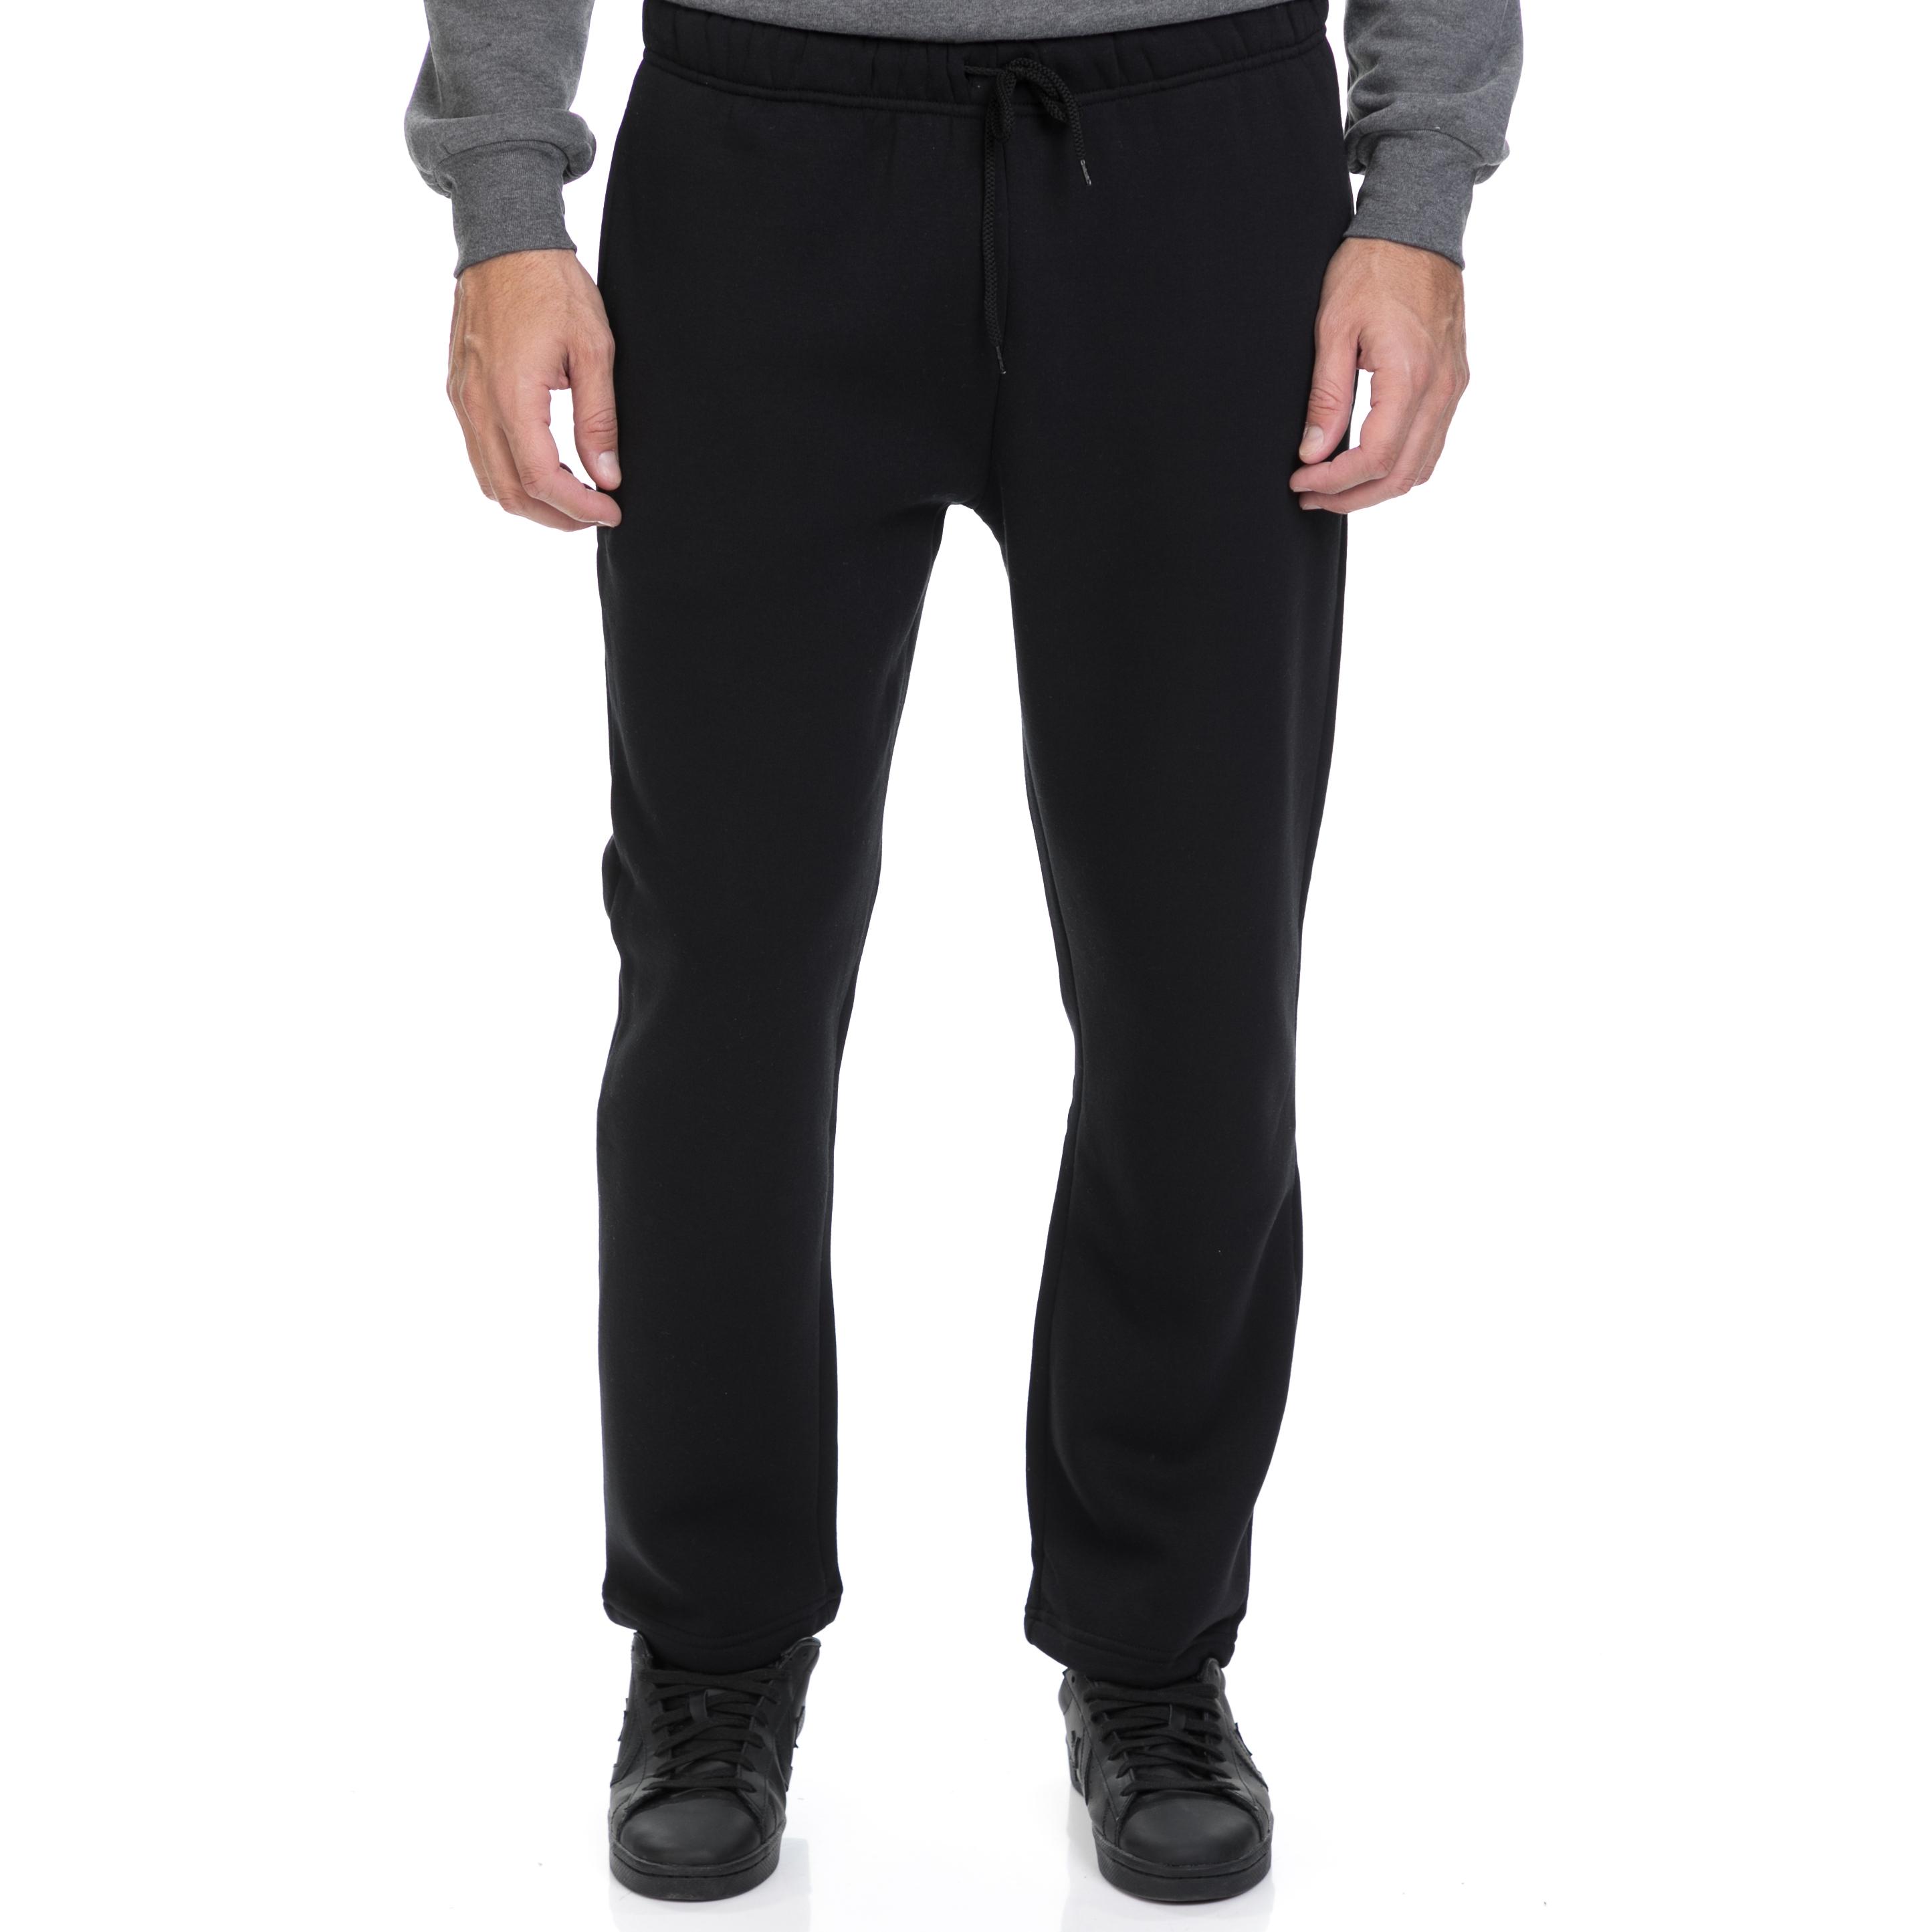 GSA - Ανδρική φόρμα GSA μαύρη ανδρικά ρούχα αθλητικά φόρμες